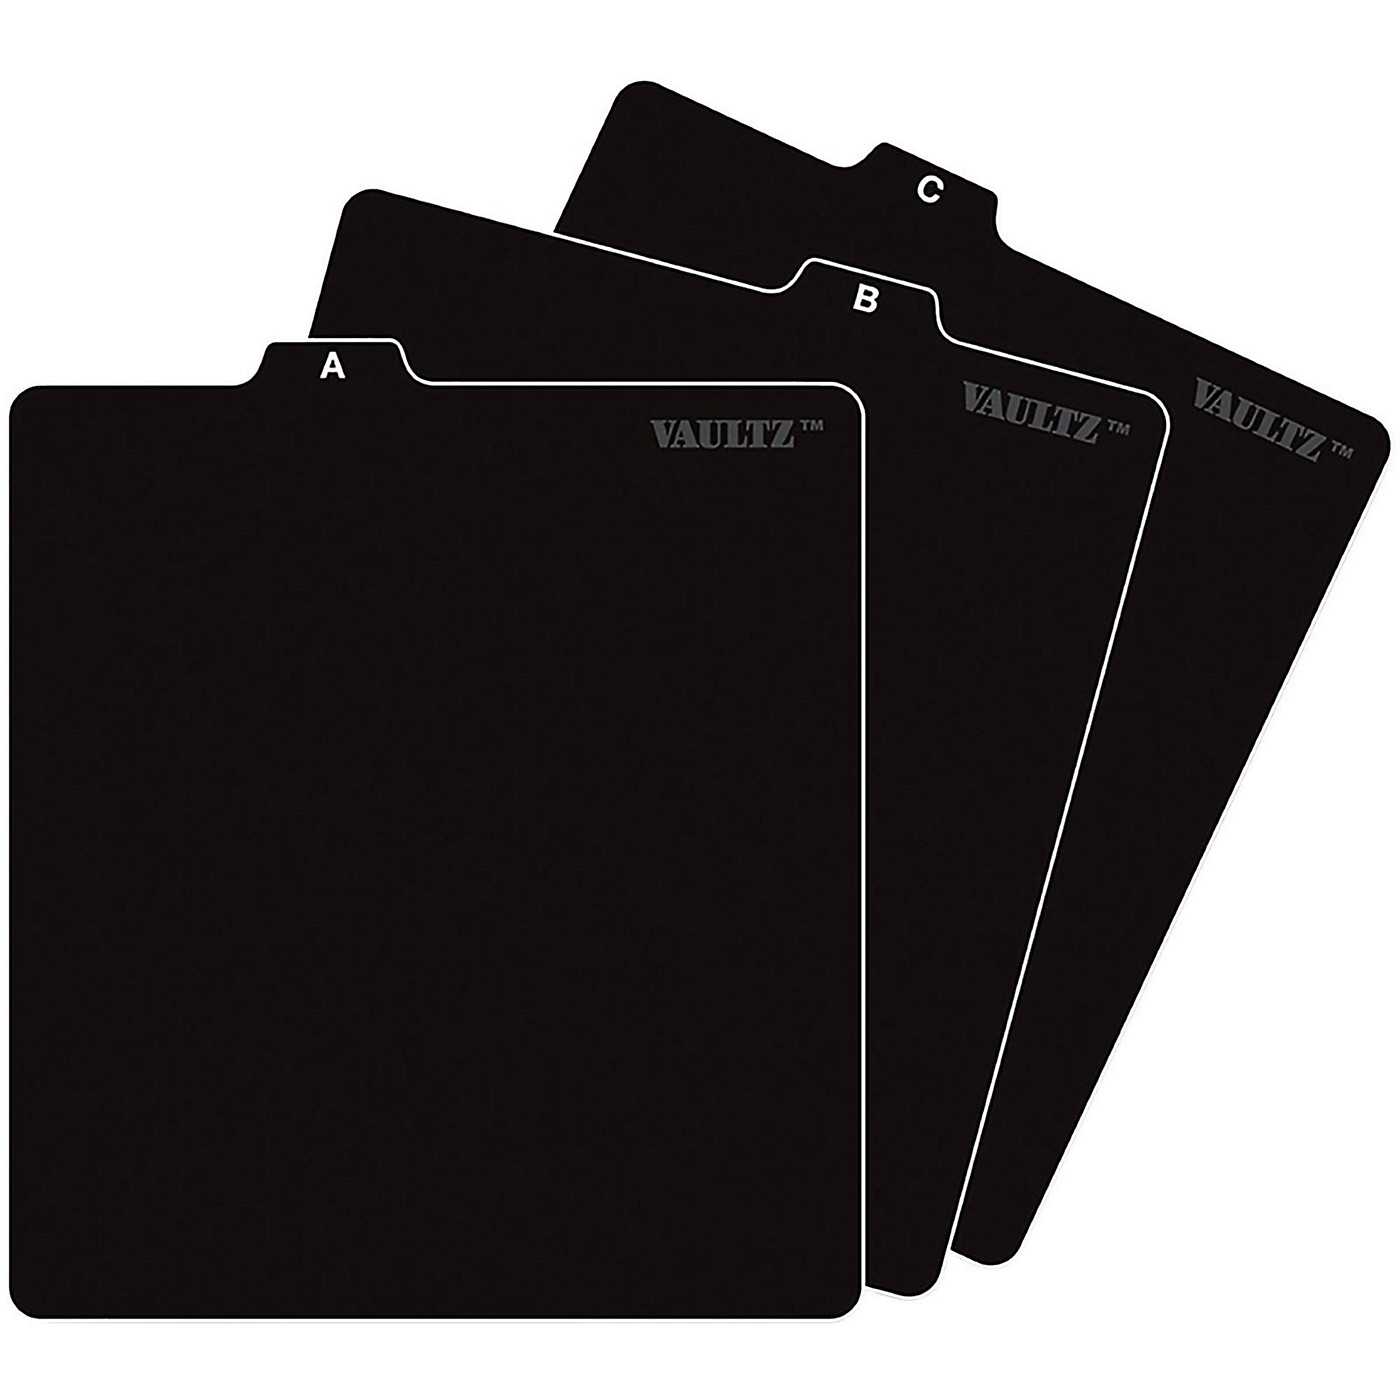 Vaultz CD File Folder Guides thumbnail